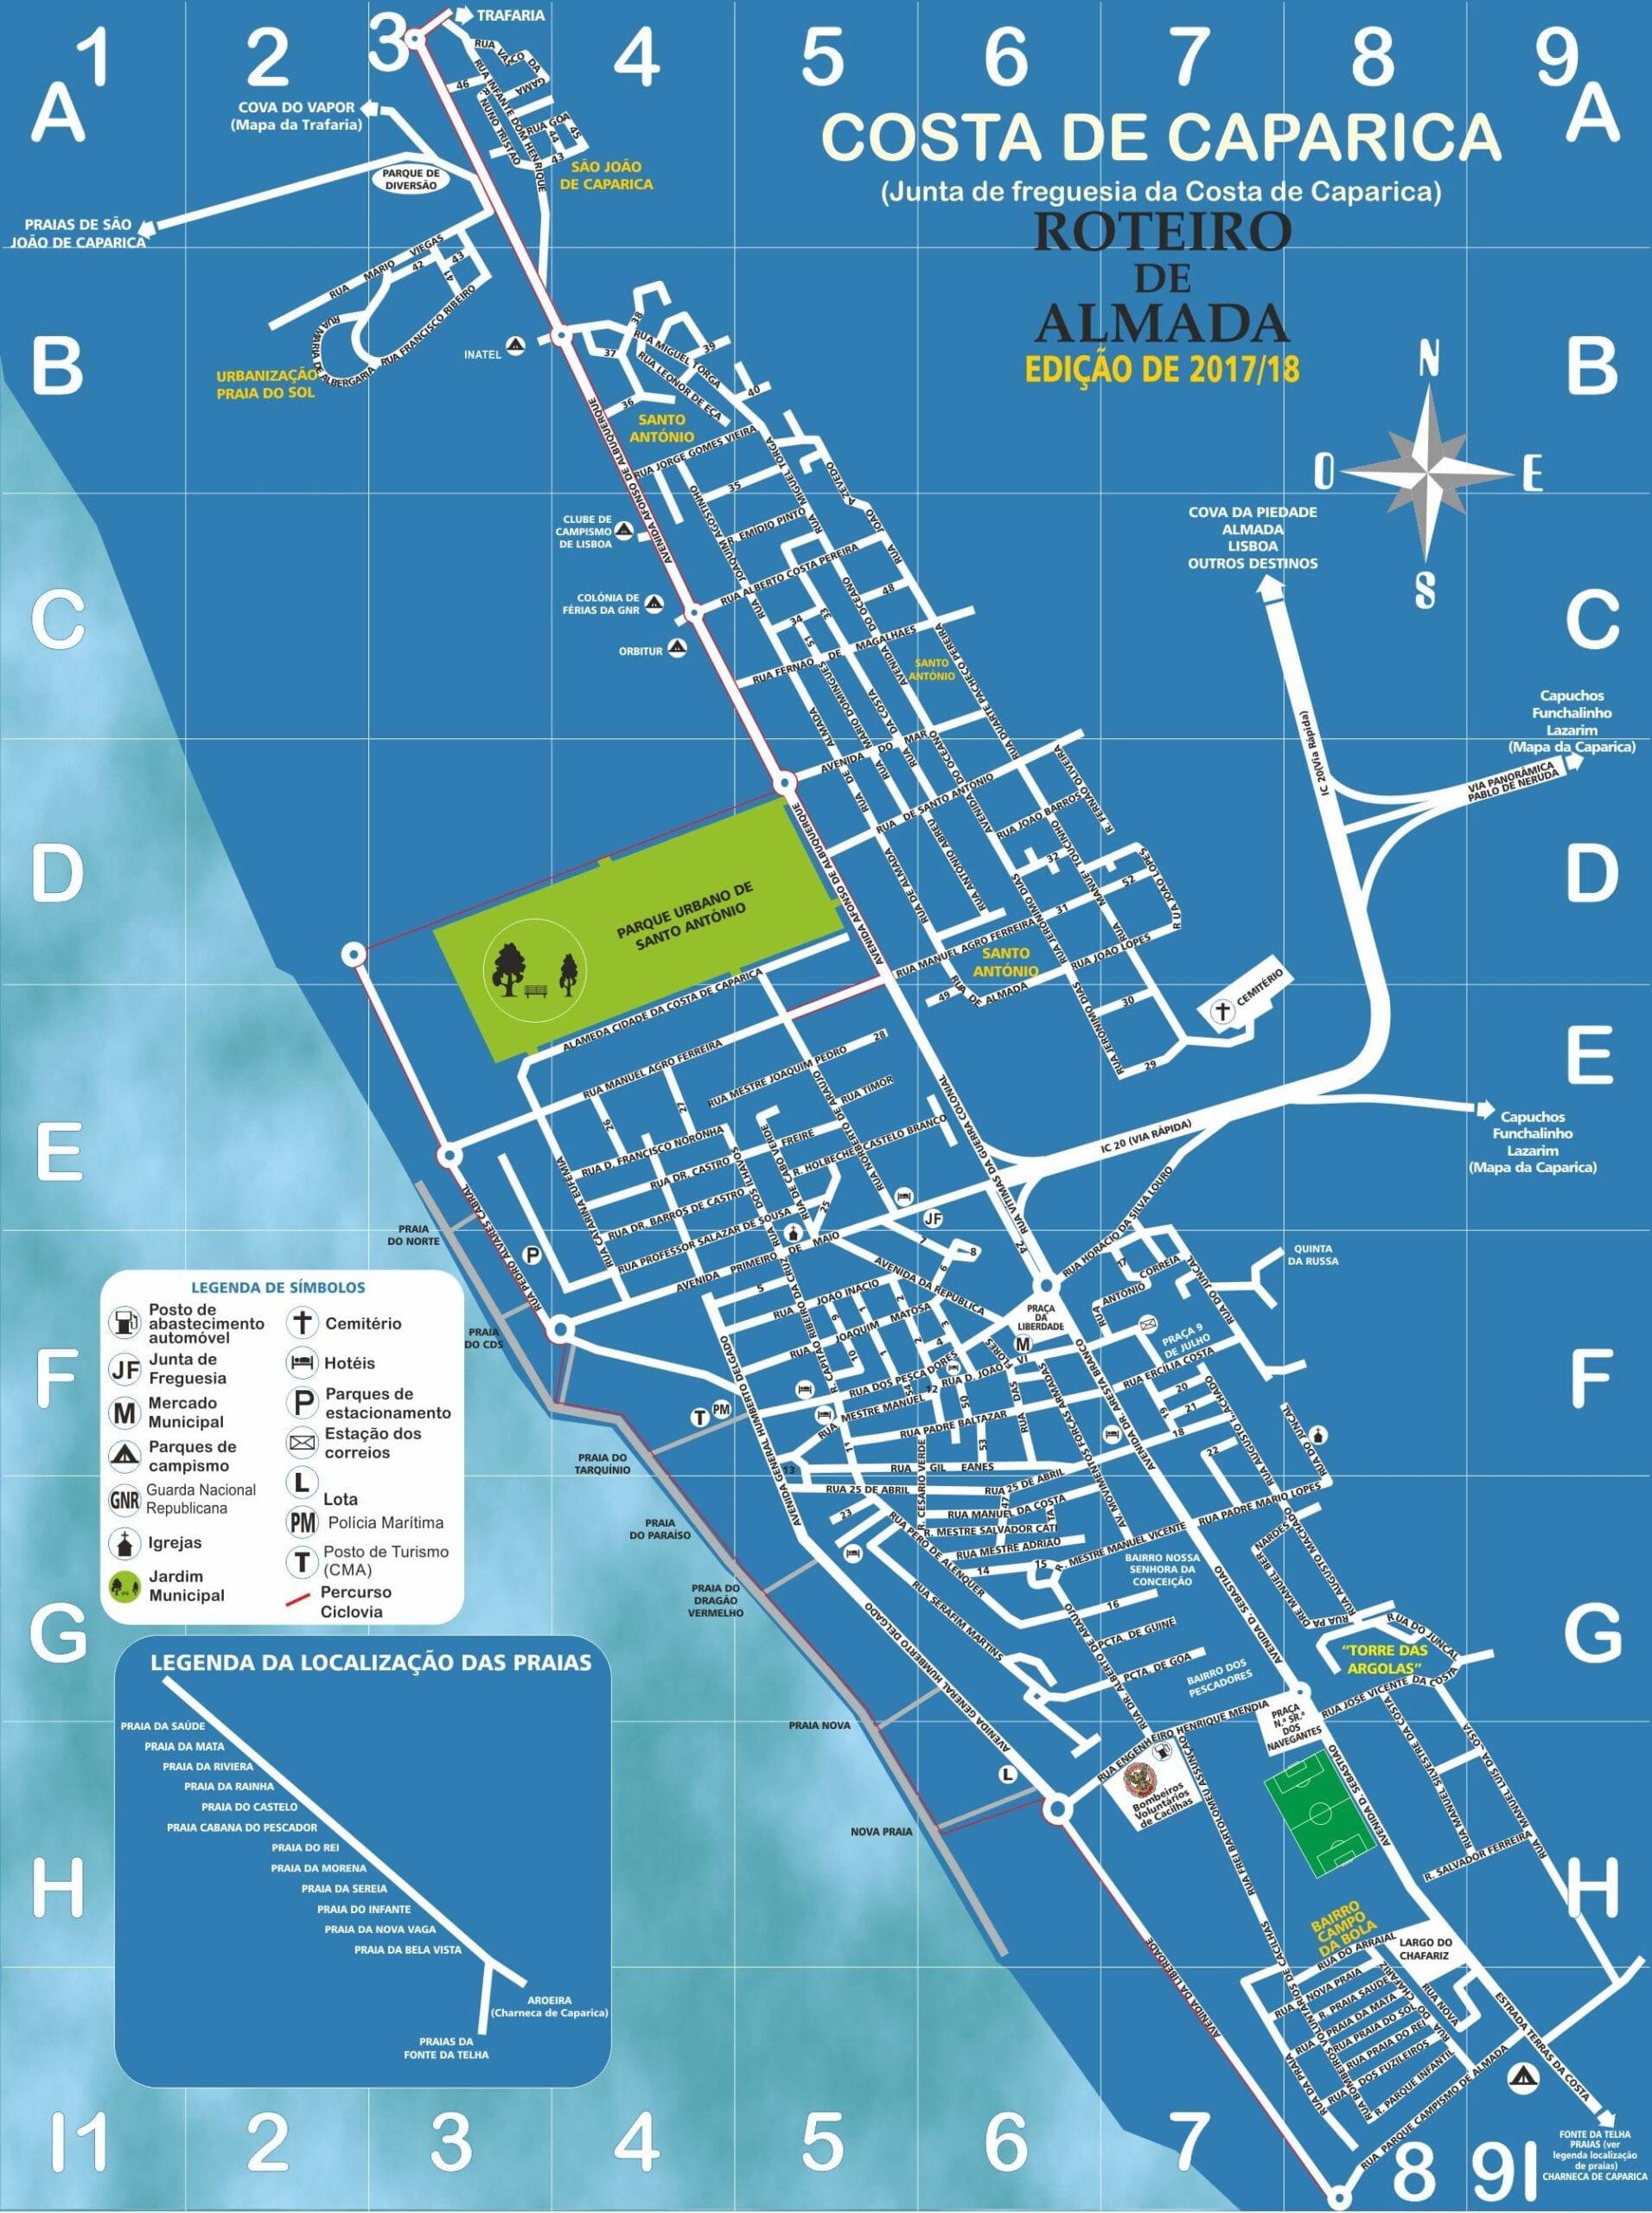 costa da caparica mapa Mapa da Costa de Caparica   Roteiro de Almada costa da caparica mapa